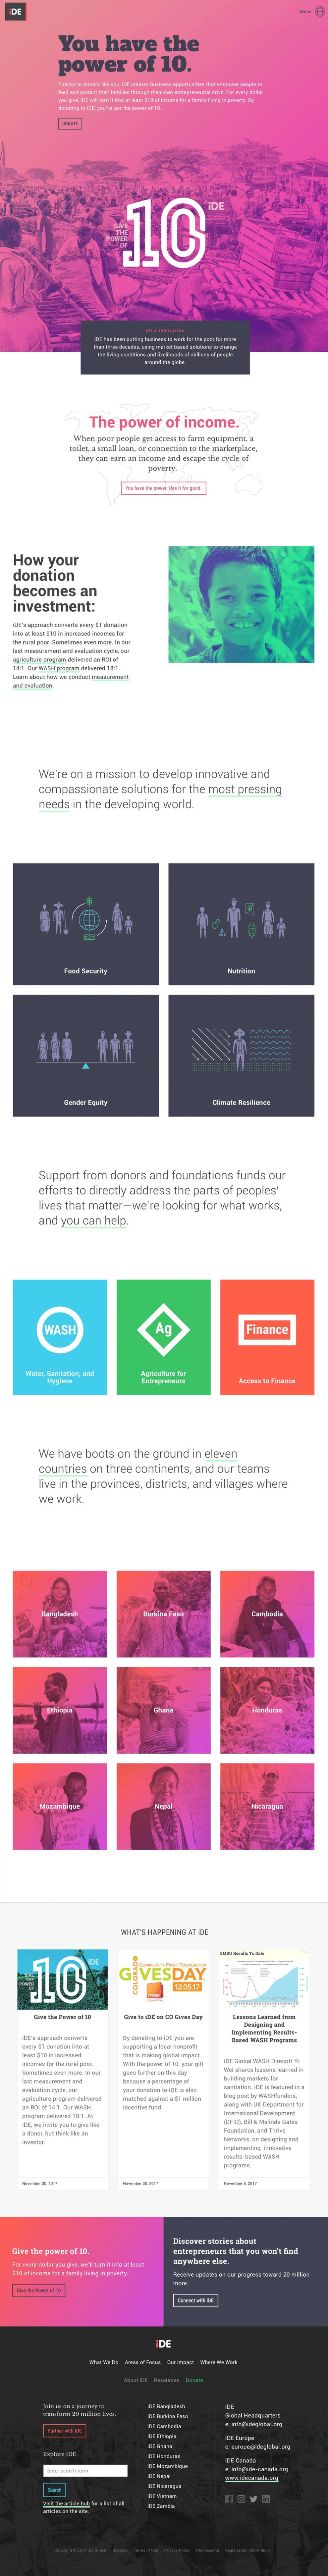 iDE Web Design Homepage